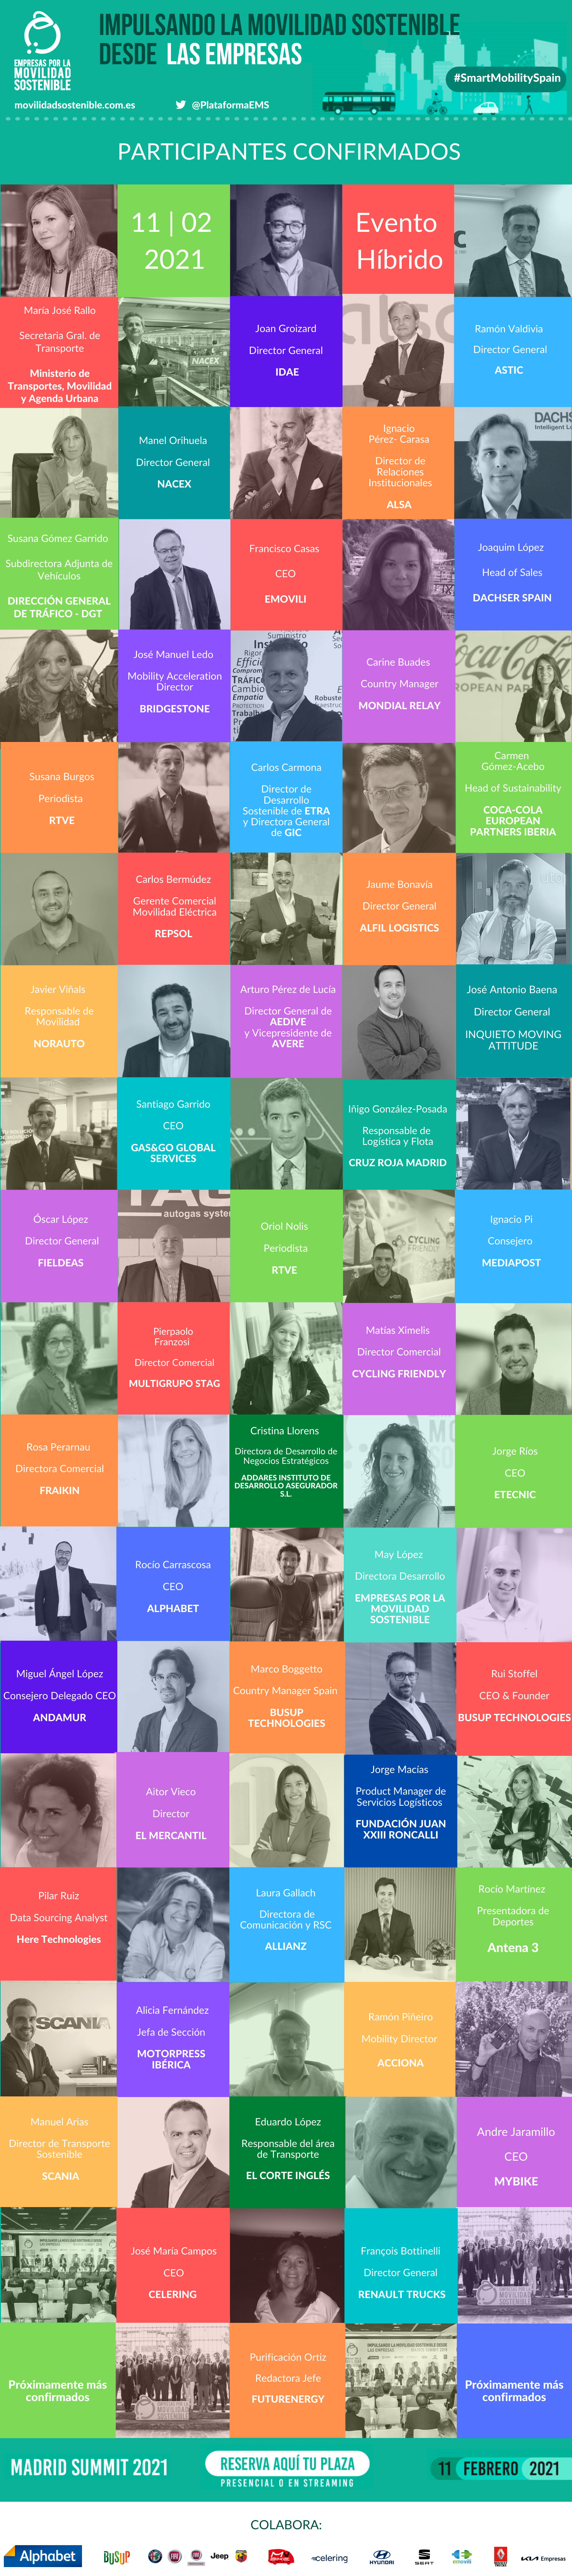 ponentes summit 2021